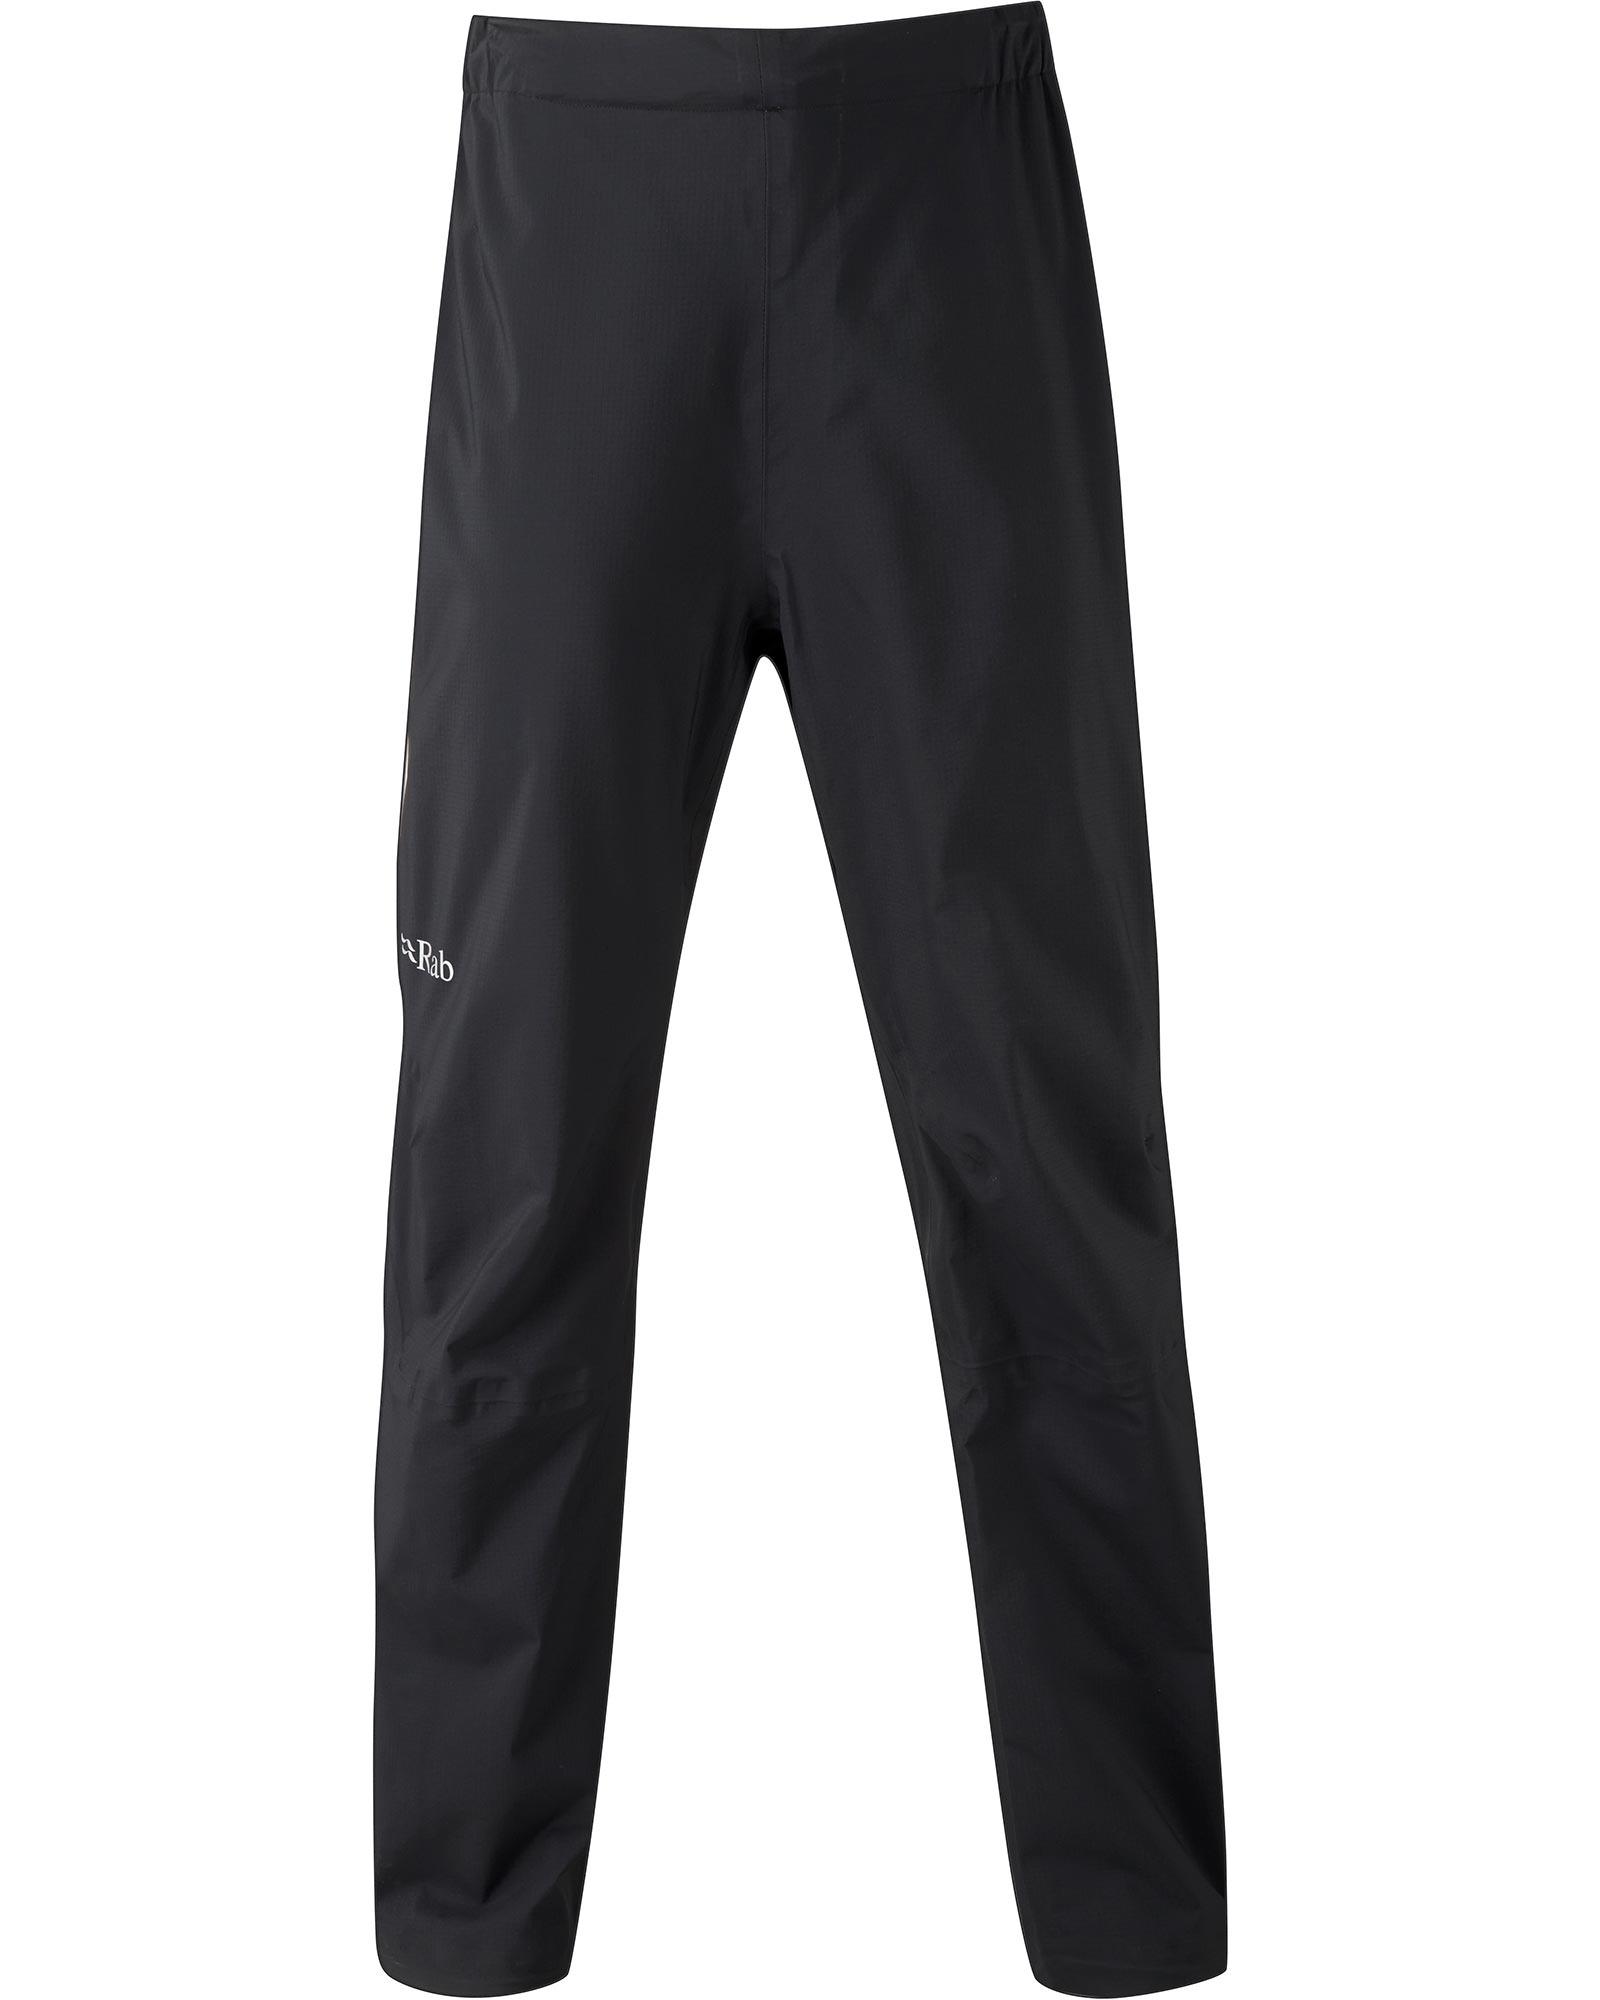 Rab Men's Firewall Pertex Shield Pants 0